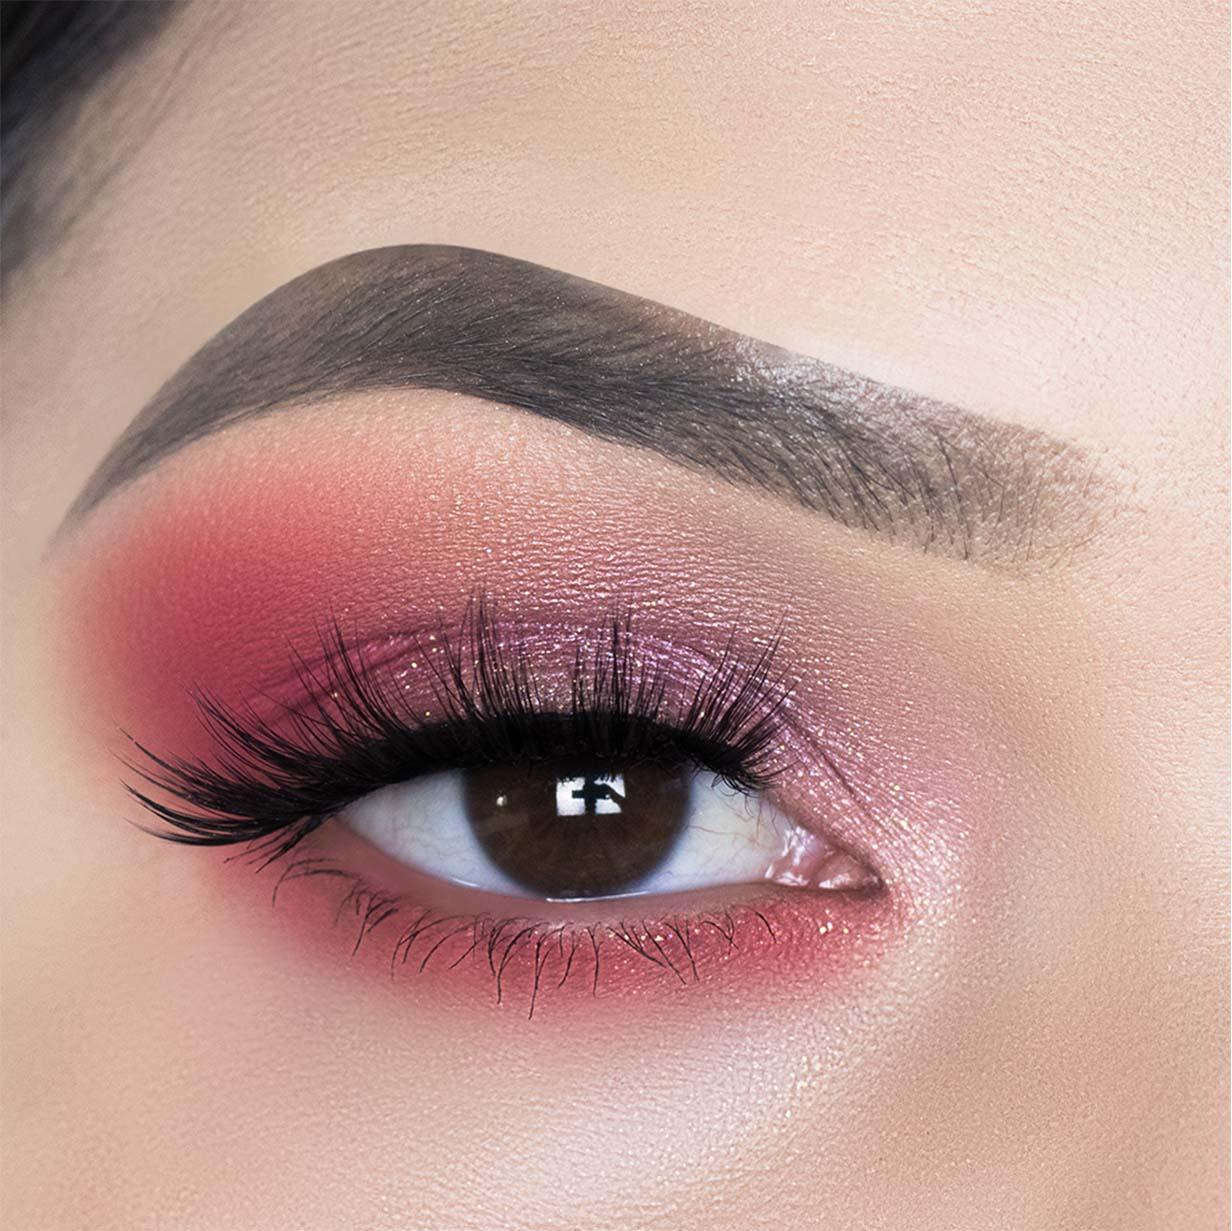 Asa de Borboleta Pigmento Suelen Makeup Veneza  - SUELEN MAKEUP